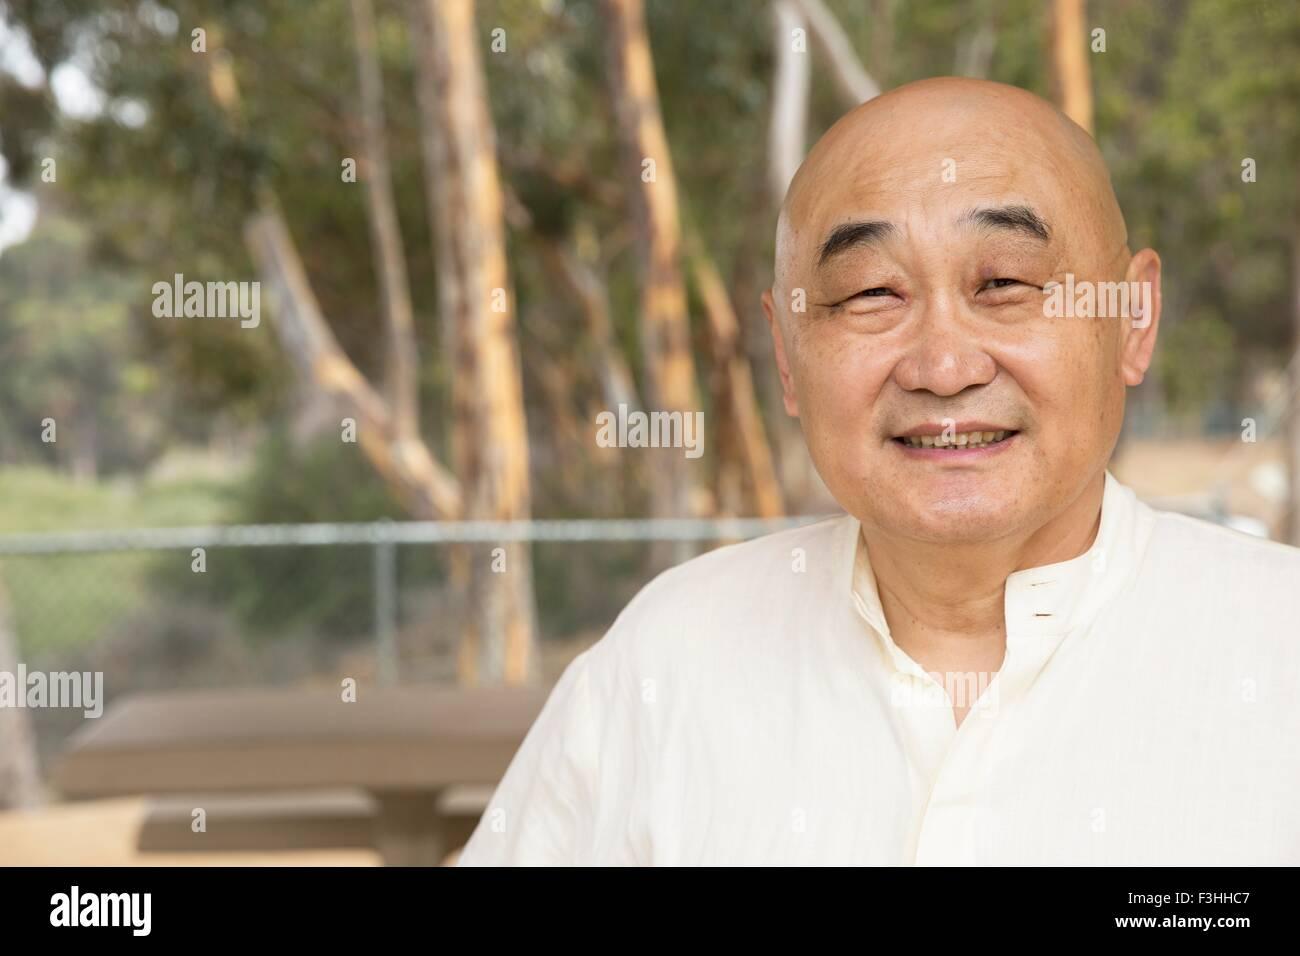 Portrait of senior man, smiling Stock Photo